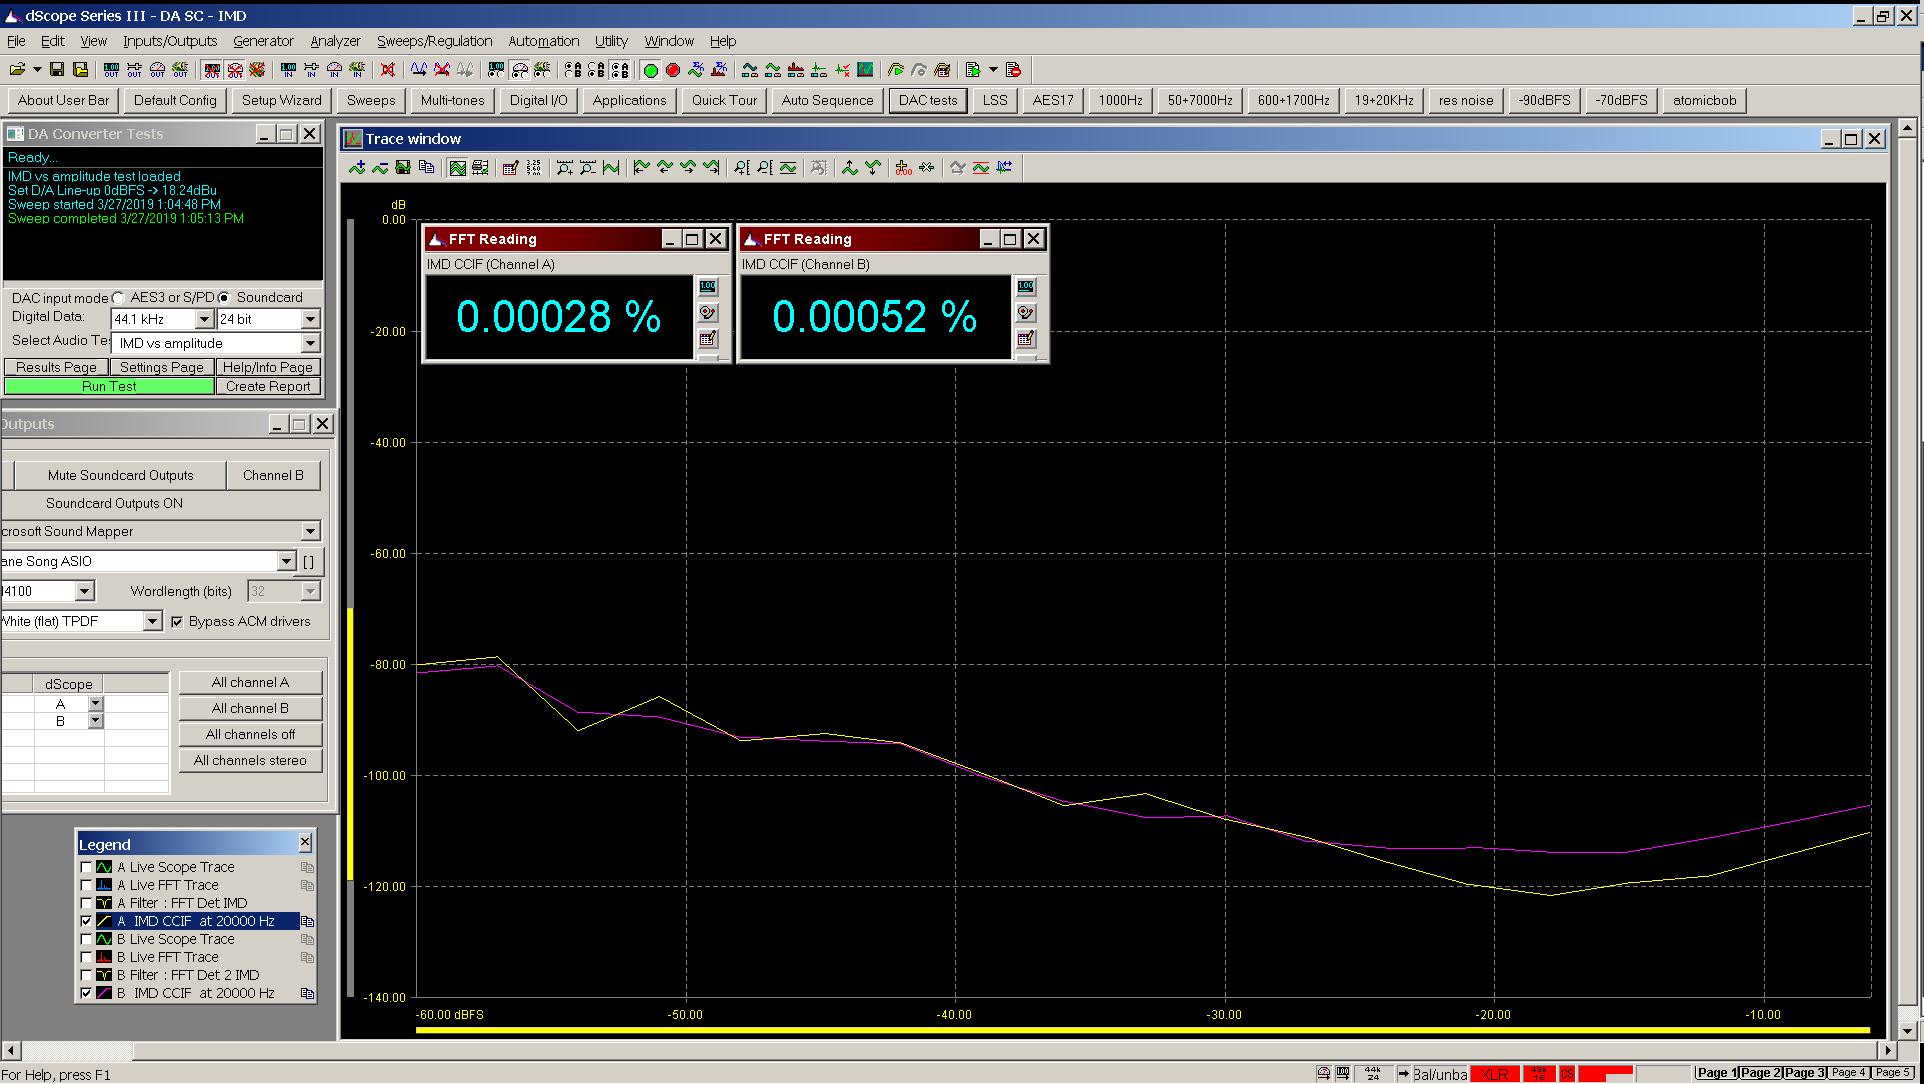 20190327-05 solaris Bal IMD vs amplitude - USB.PNG